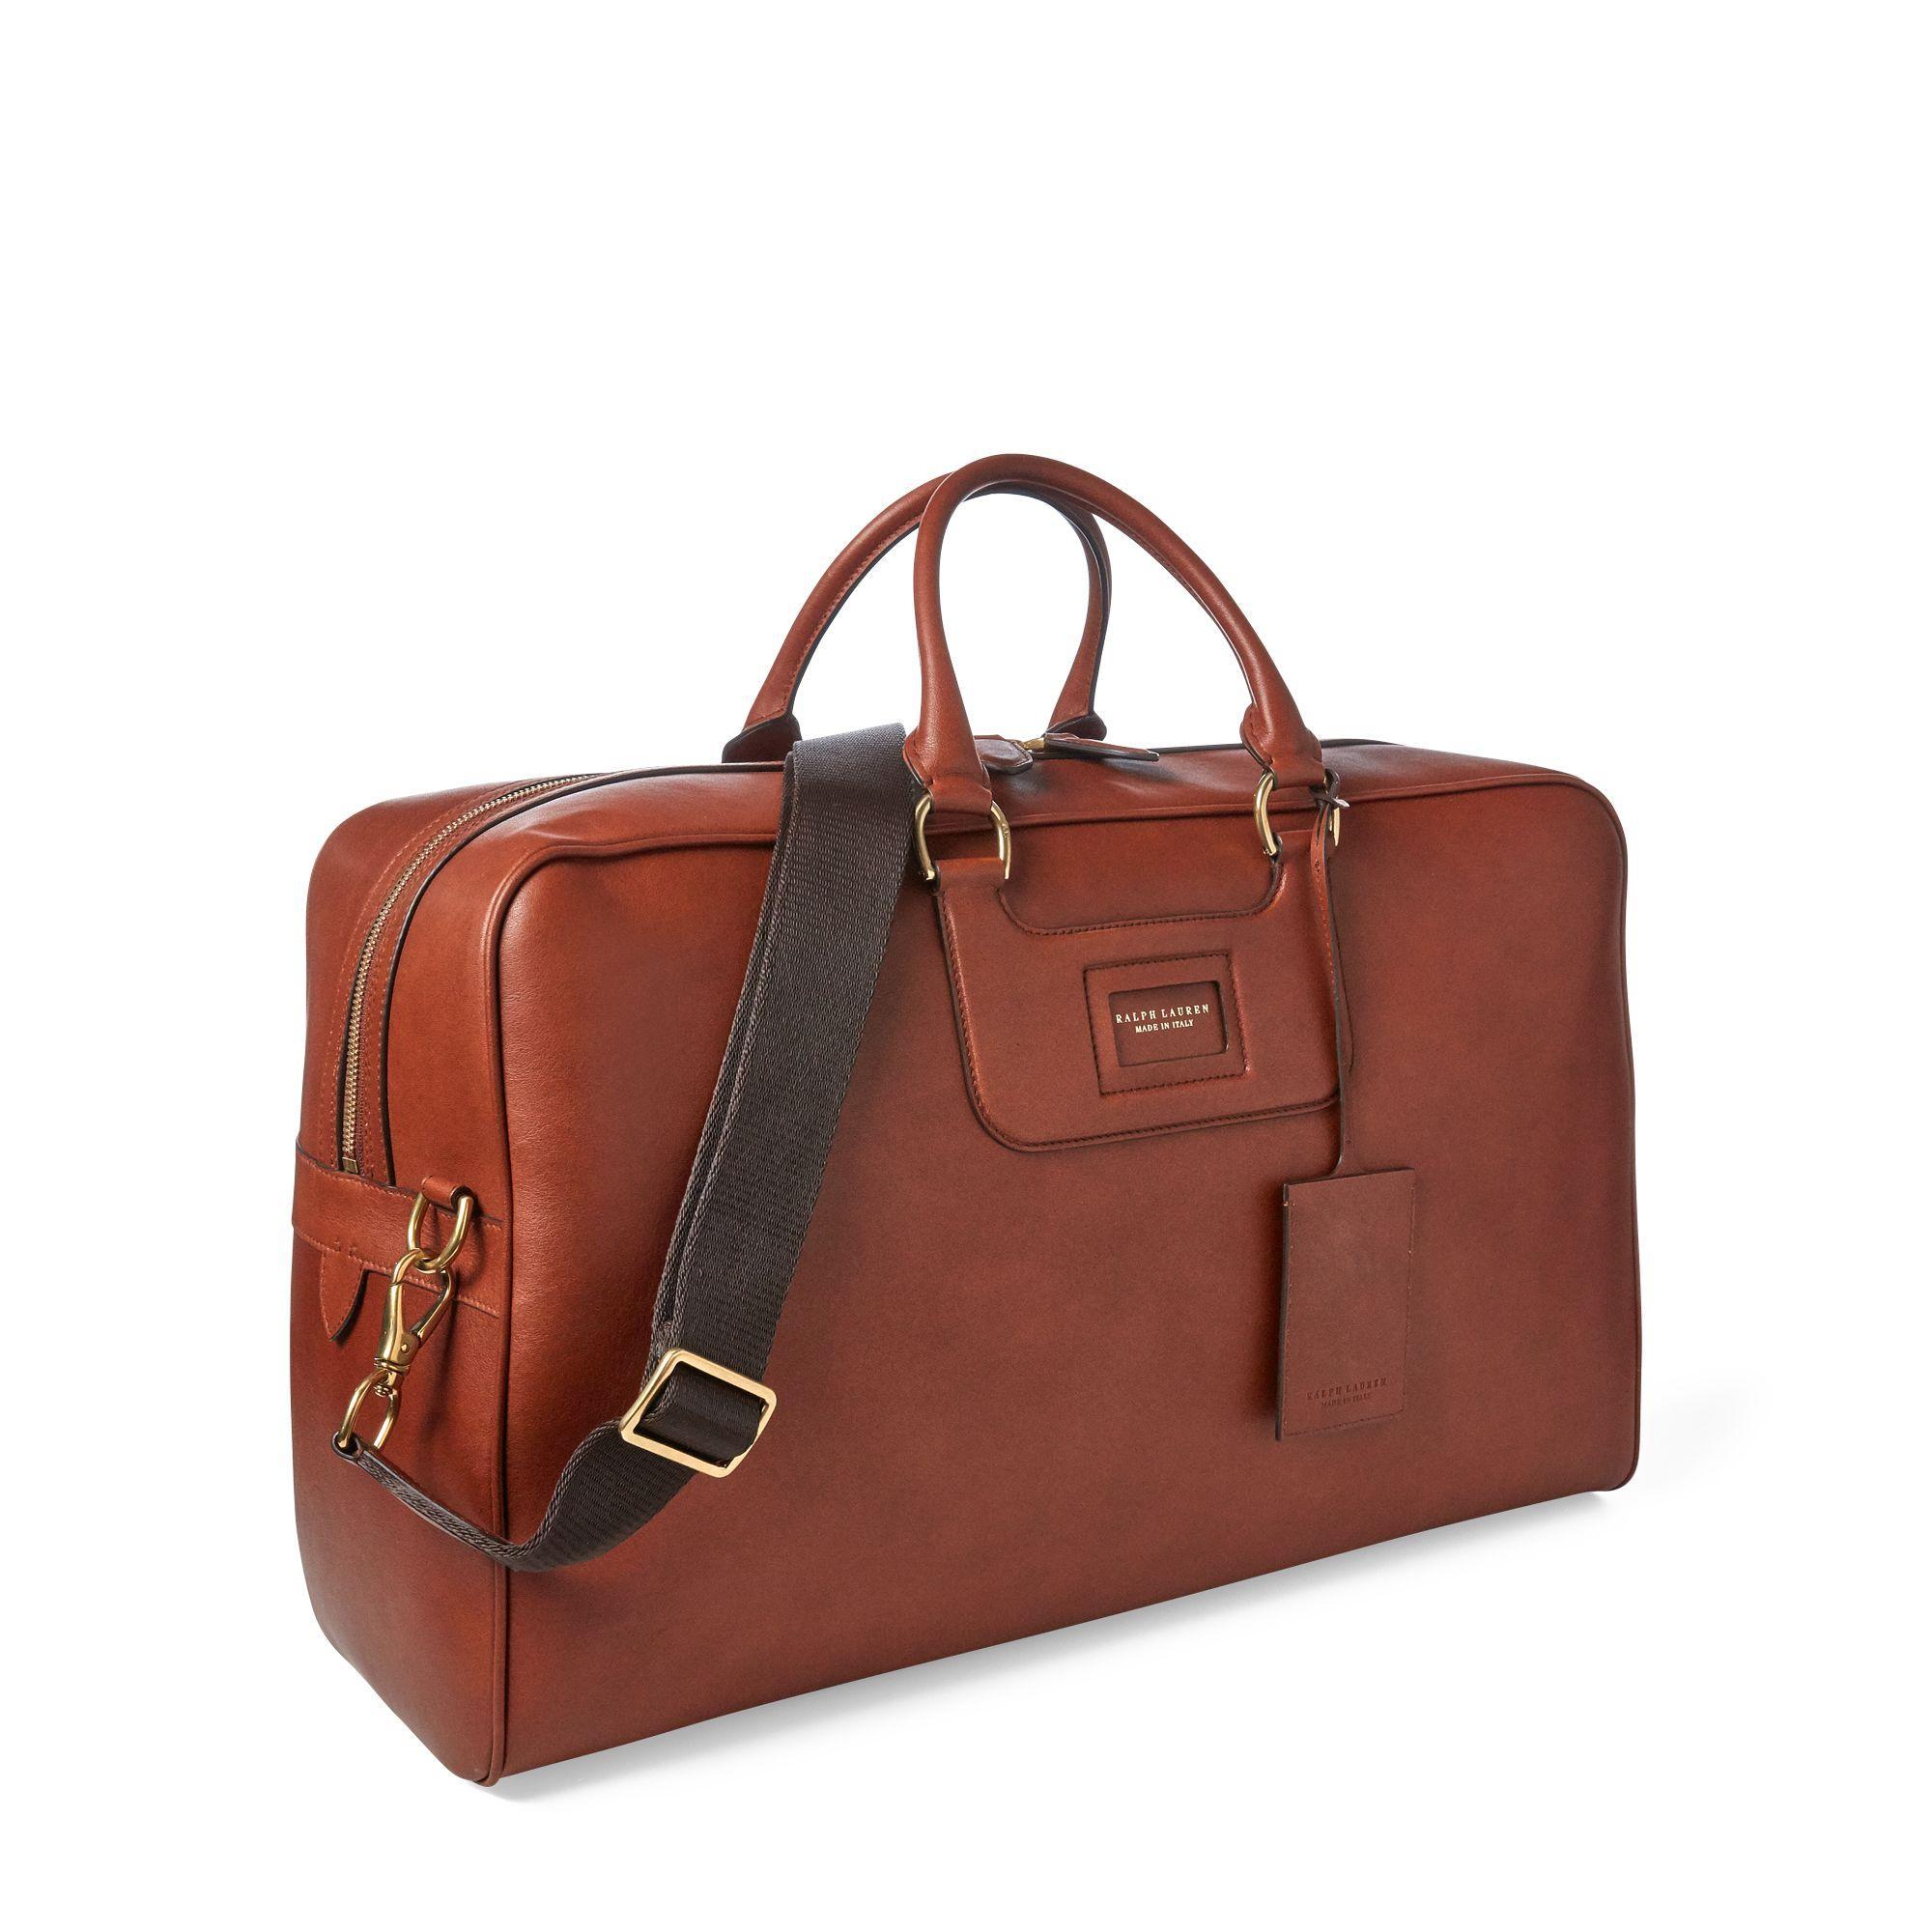 Lyst - Ralph Lauren Purple Label Calfskin Duffel Bag in Brown for Men 9e1c44e28b855